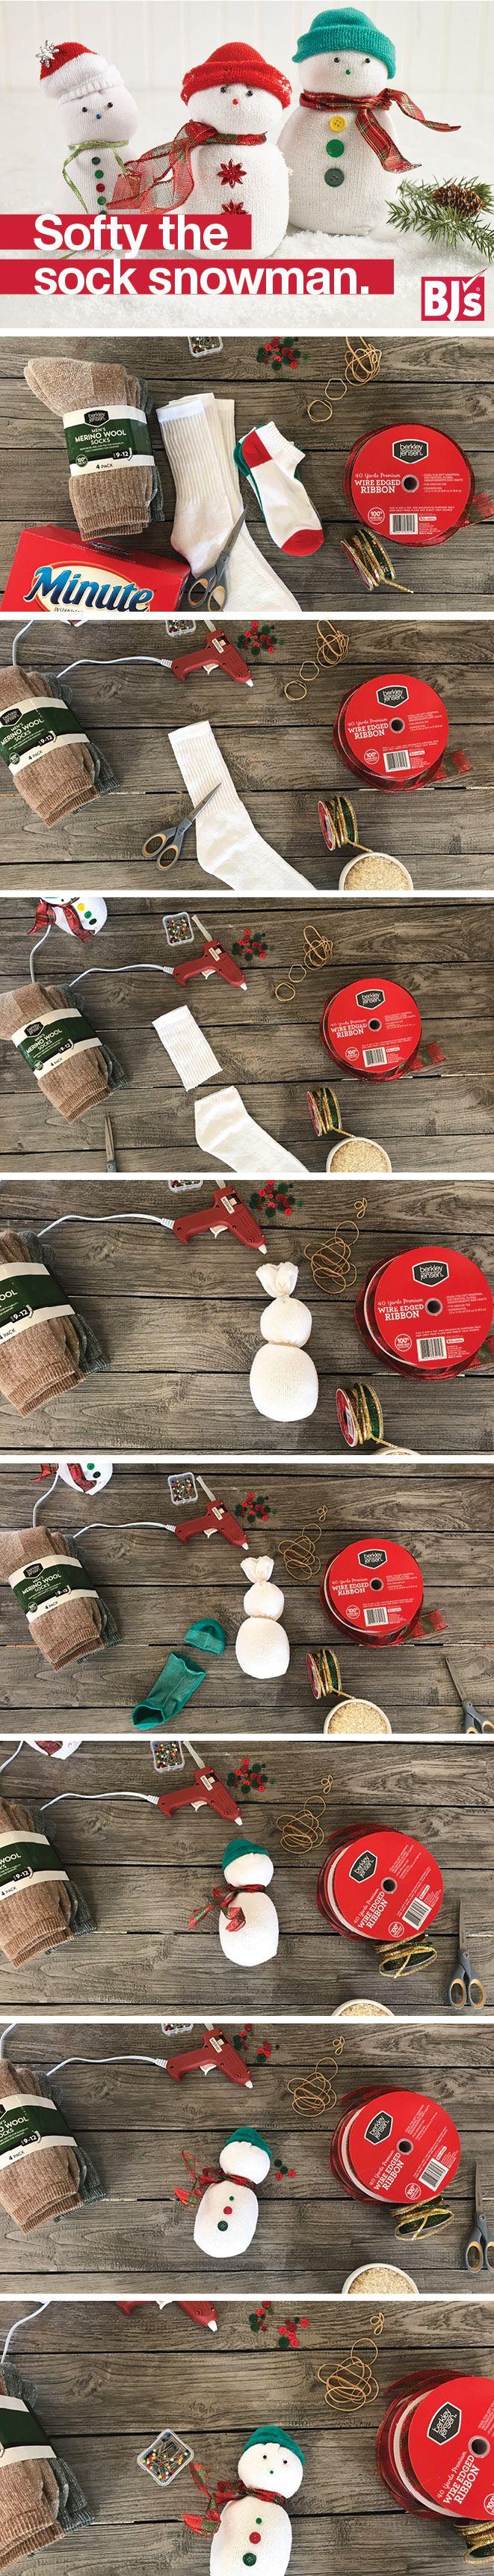 Adorable sock craft. Make a sock snowman for a DIY holiday mantel decoration. http://stocked.bjs.com/inspiration/softy-sock-snowman